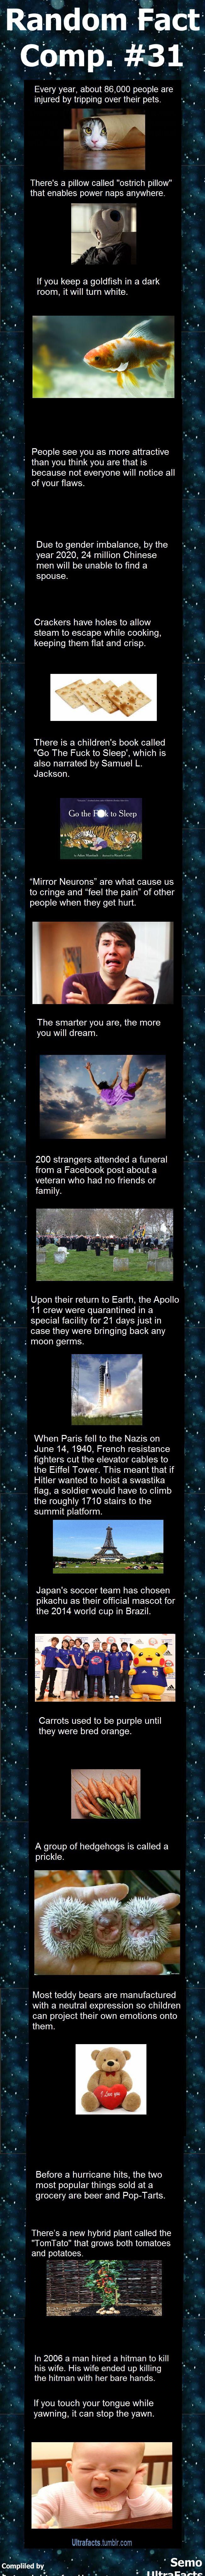 Random Fact Comp